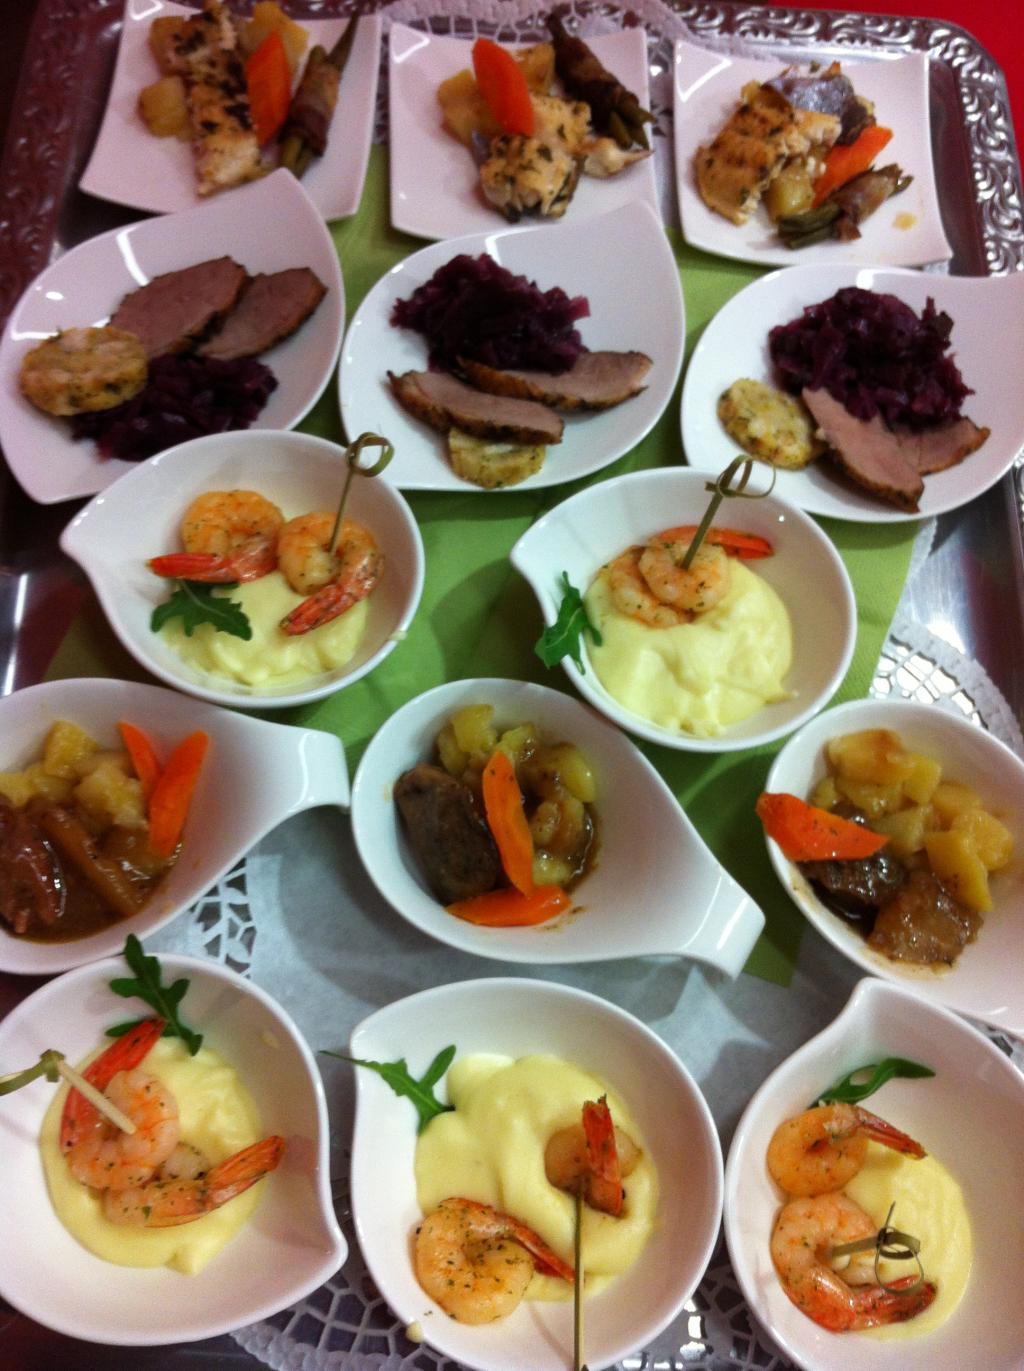 Warme gerichte ganglberger catering for Leichte warme gerichte